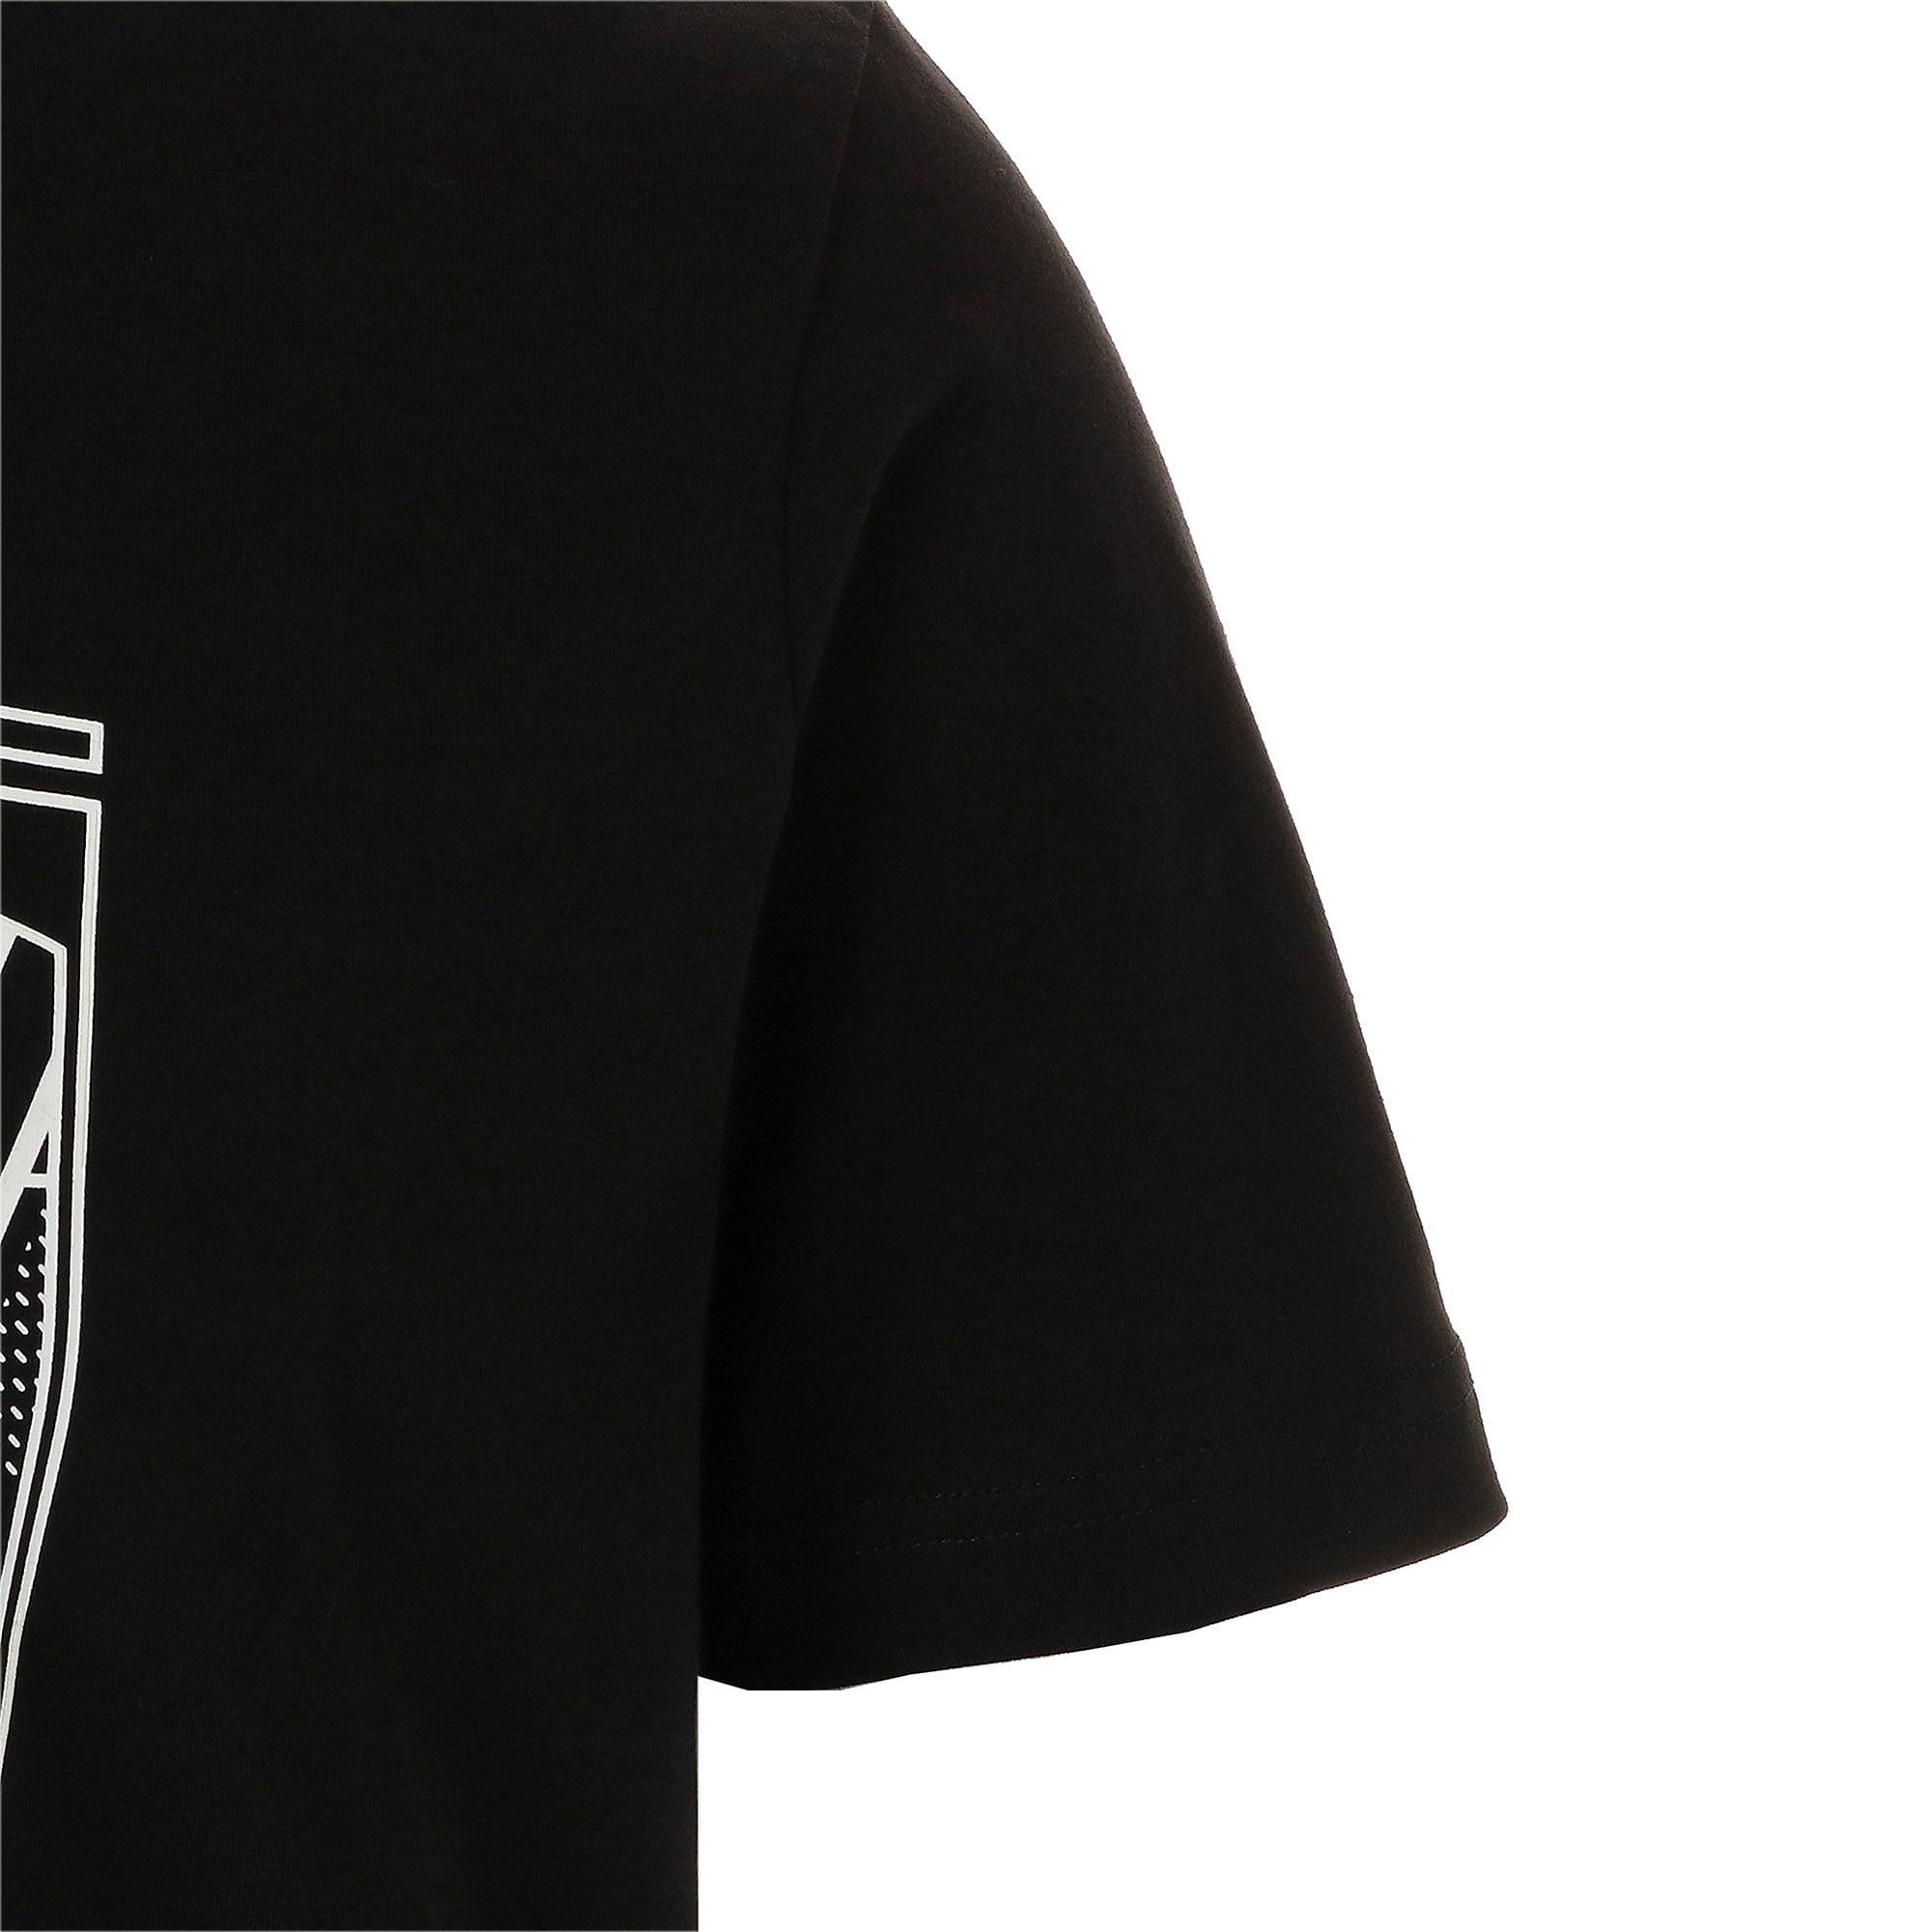 Thumbnail 5 of フェラーリ ビッグシールド Tシャツ + 半袖, Puma Black, medium-JPN